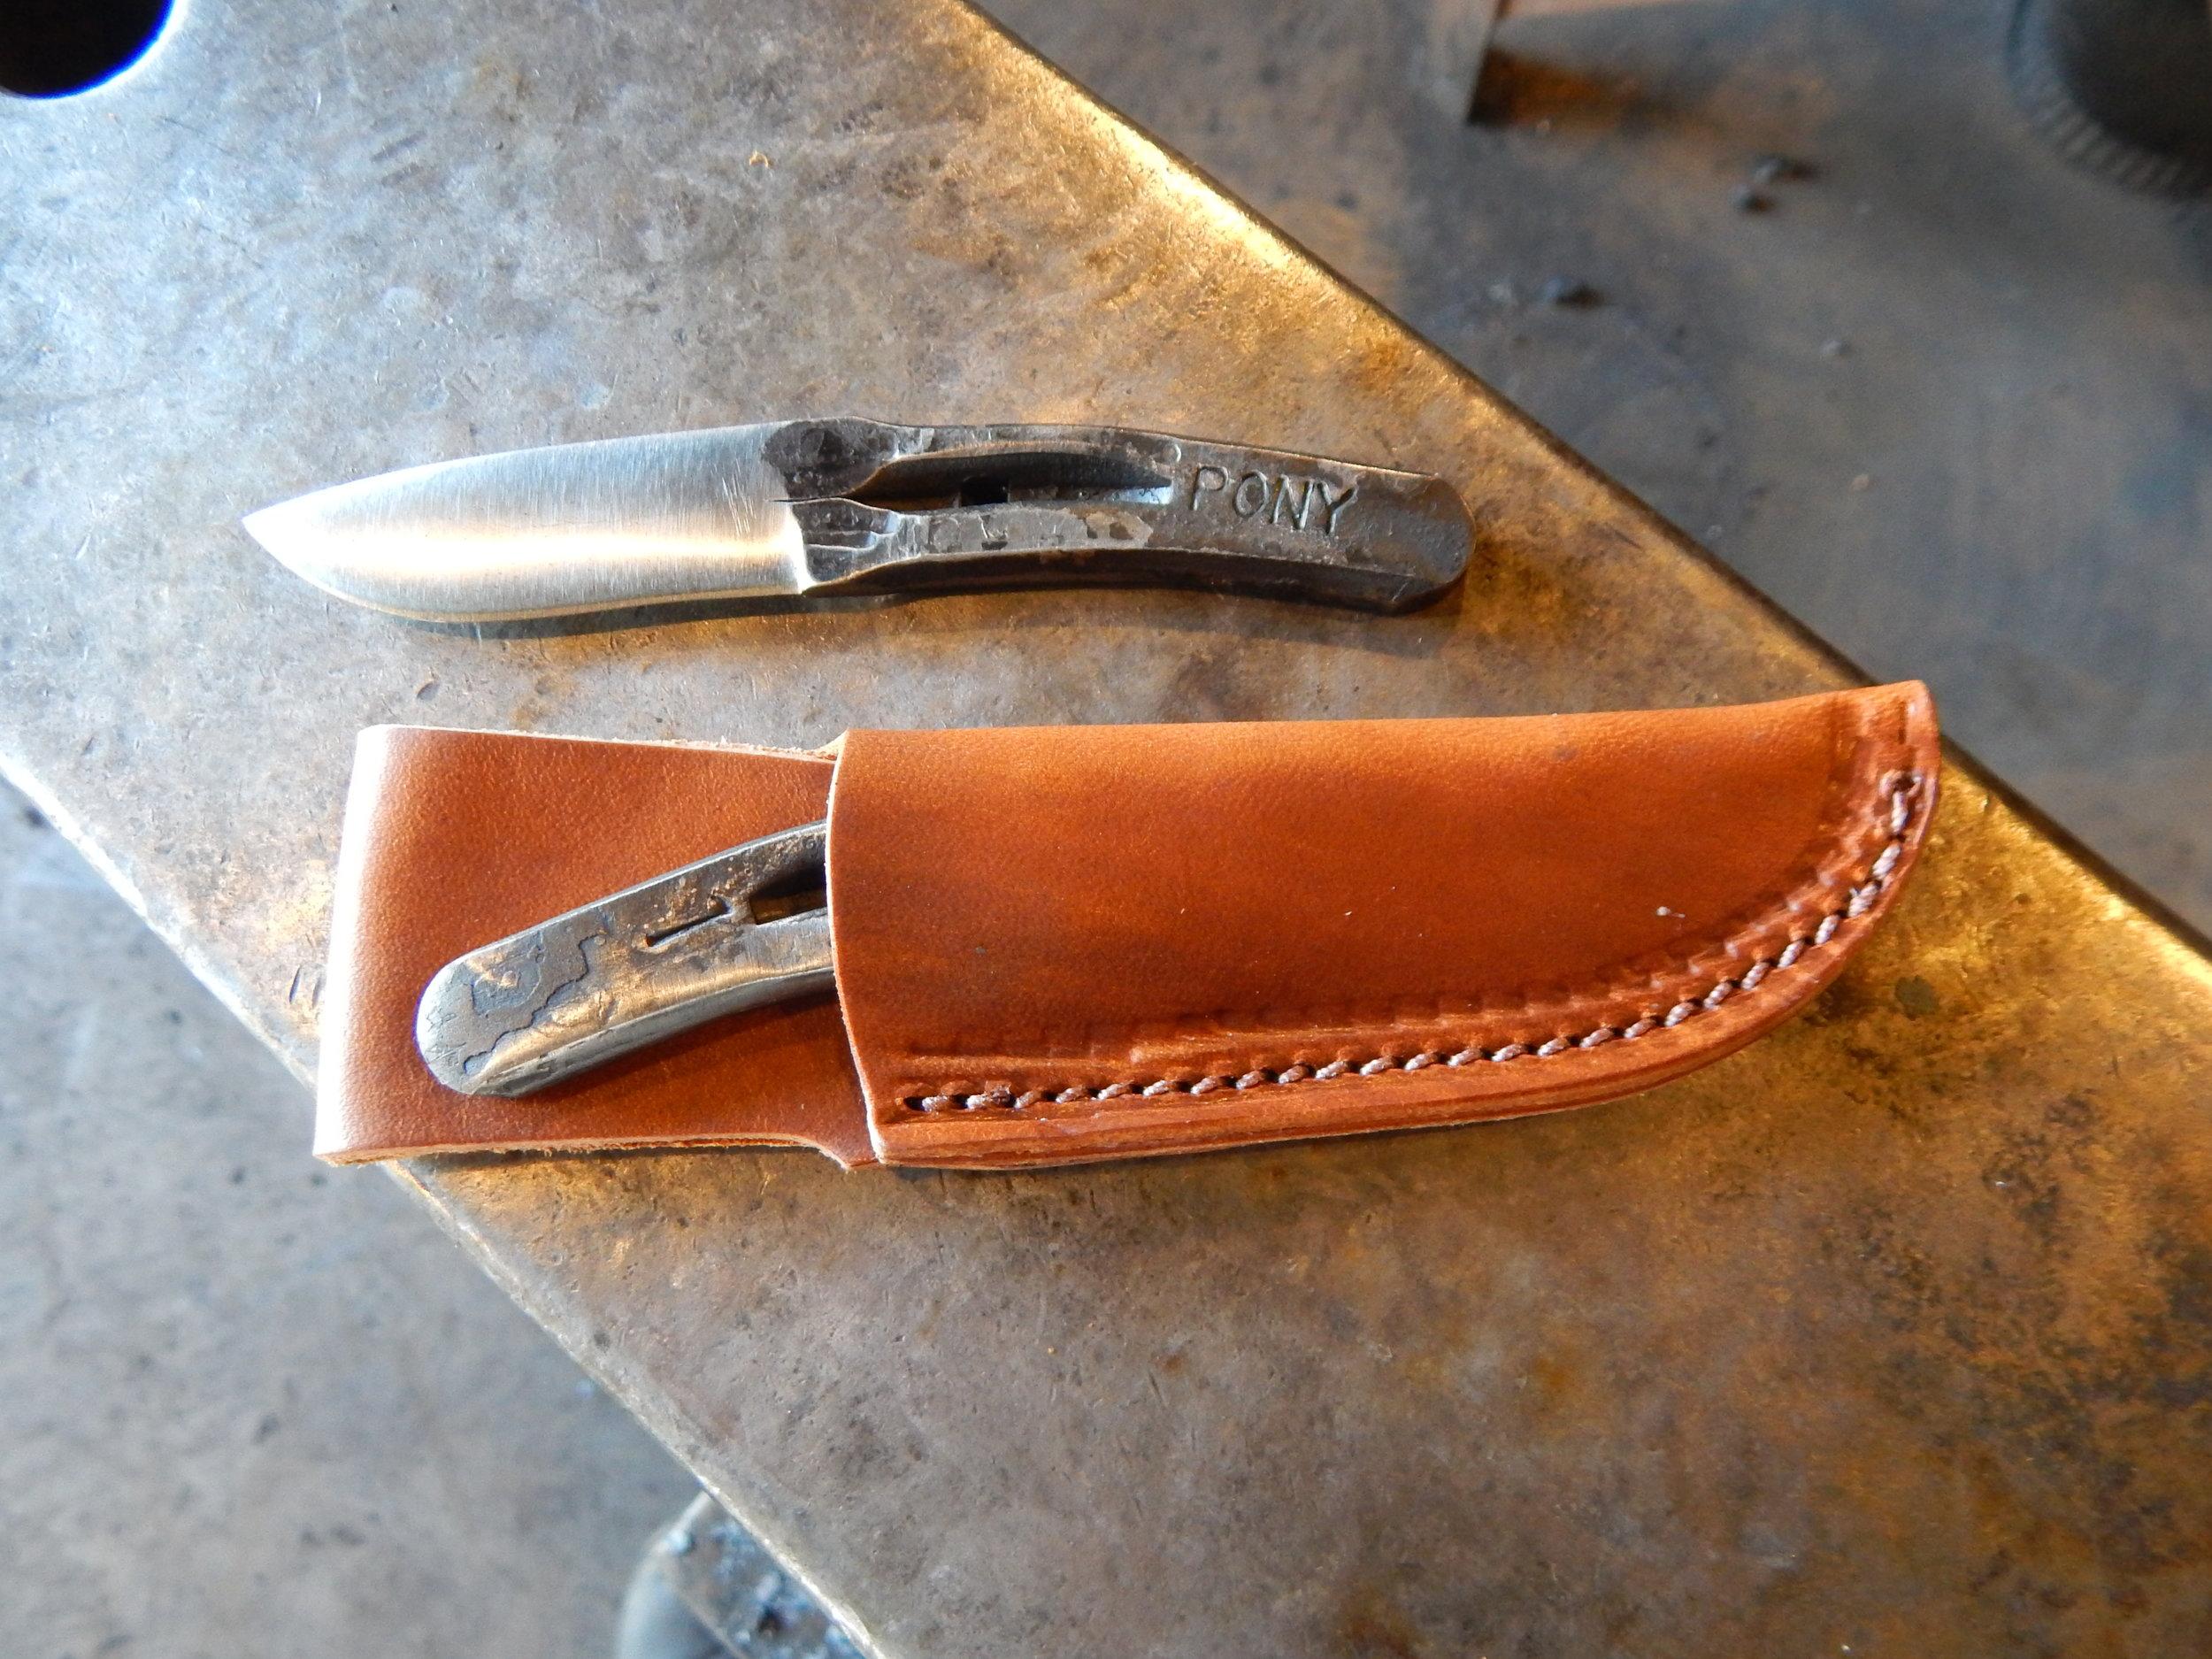 Pony Shoe Knife